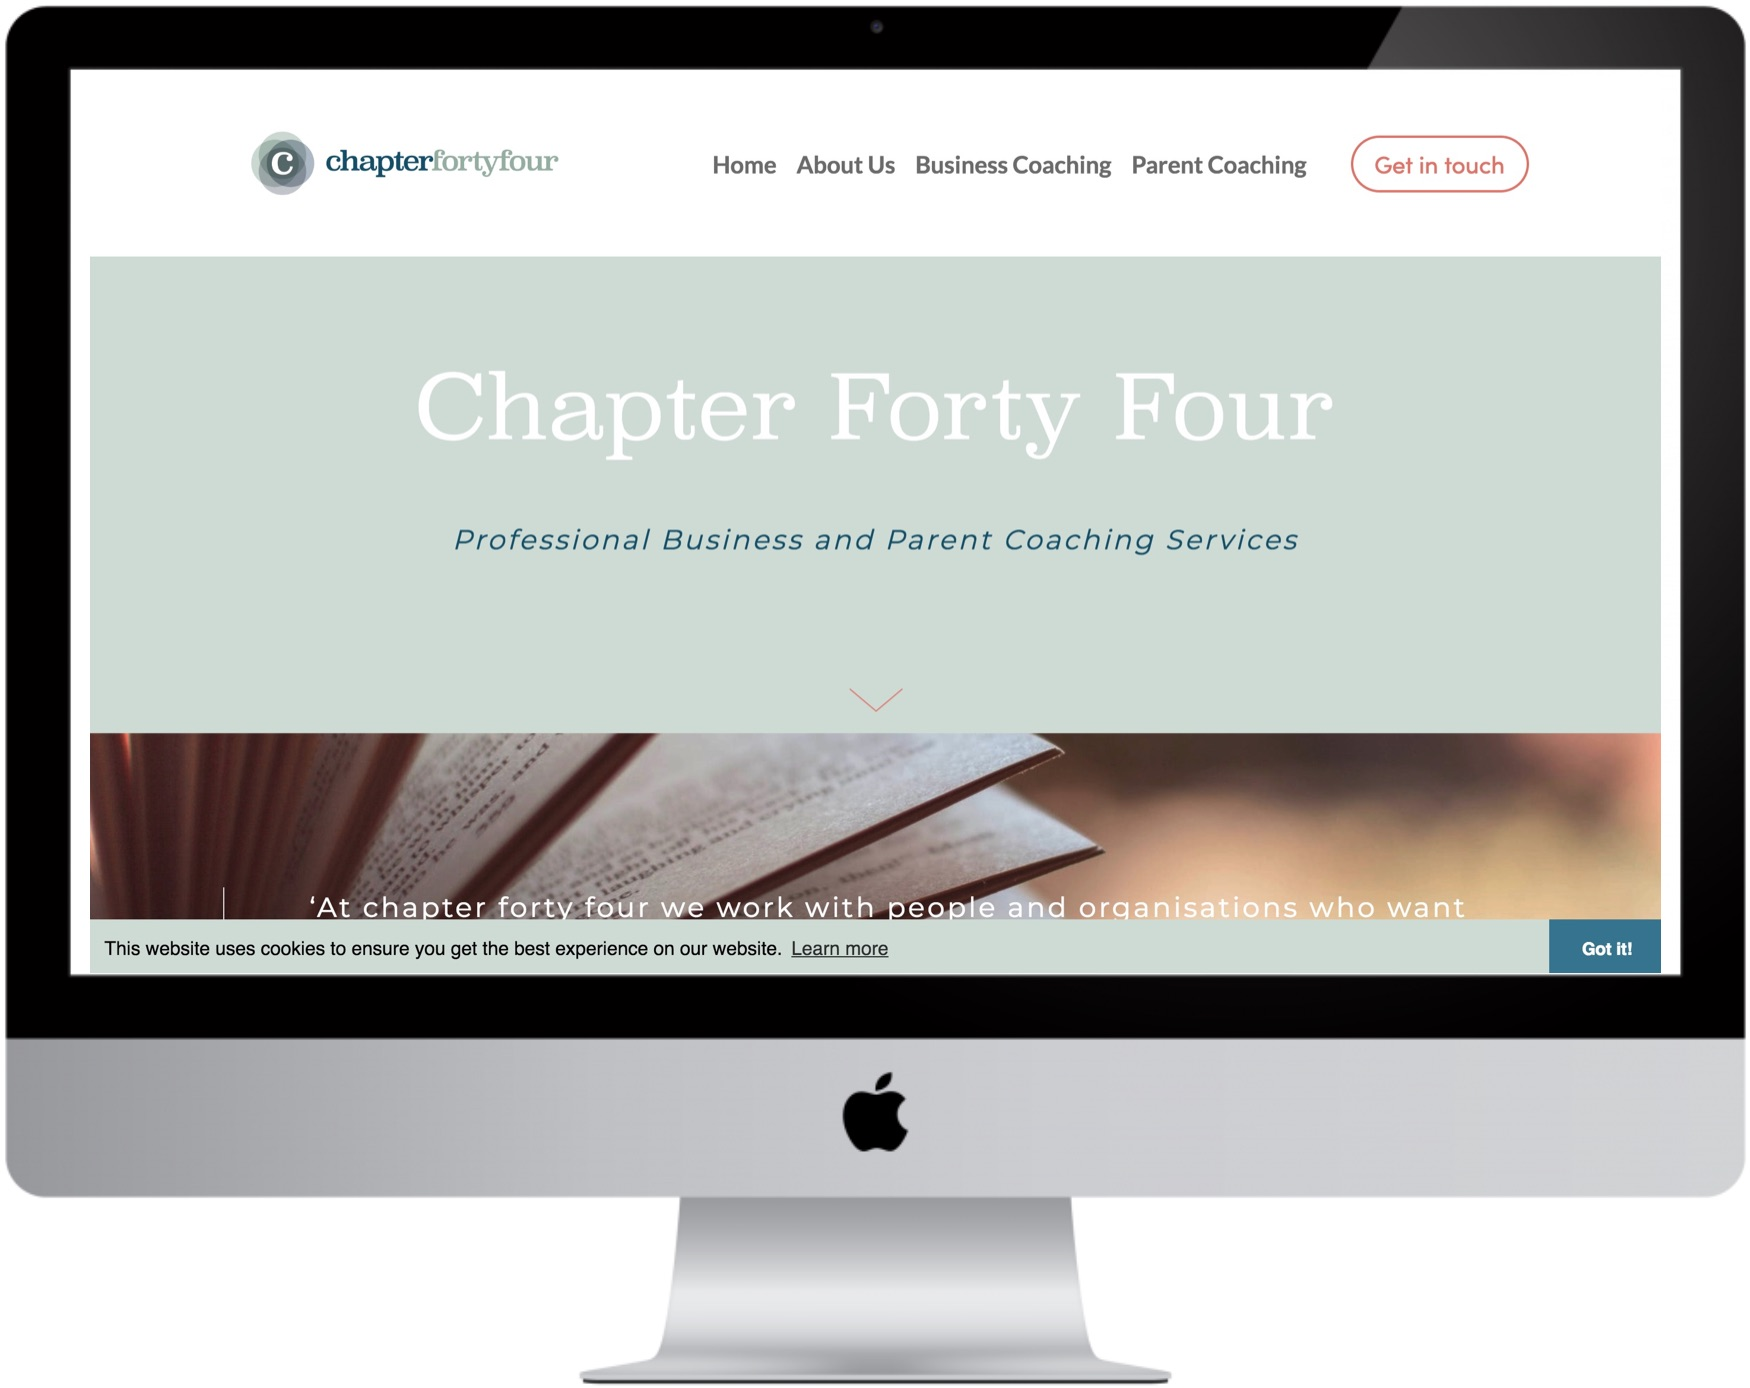 Chapter Forty Four Ravenspoint Marketing.jpg